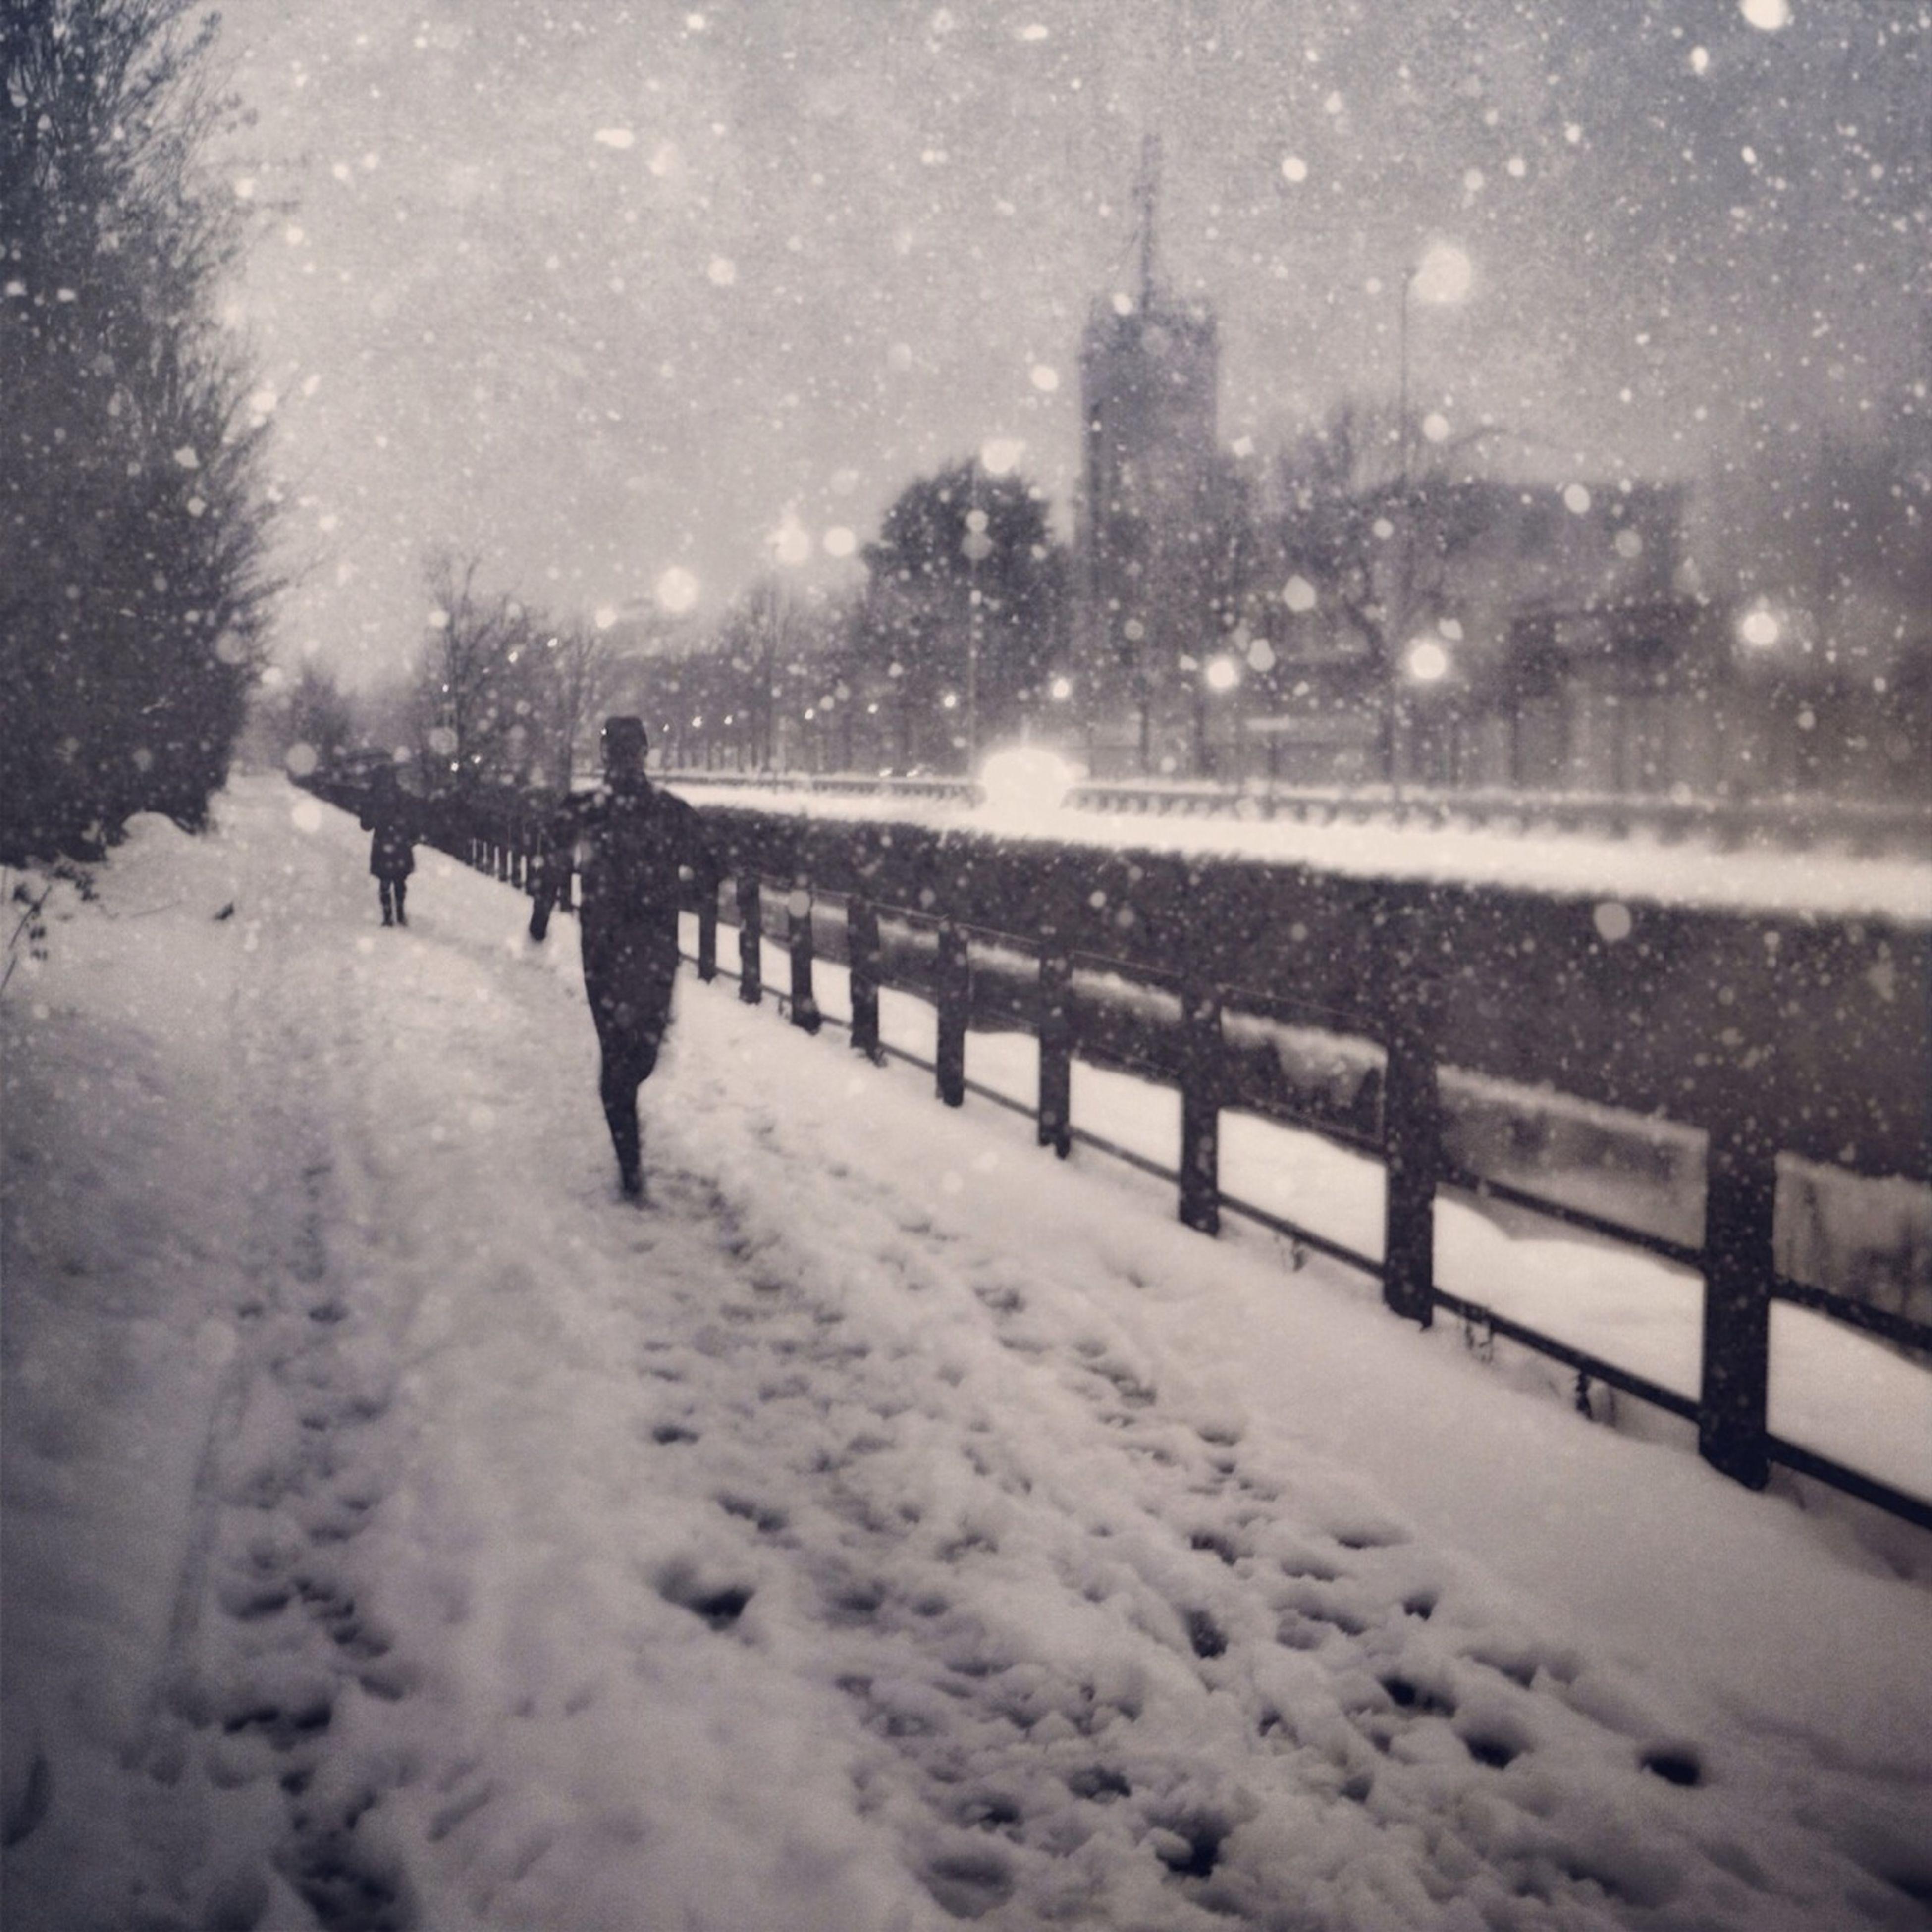 snow, winter, cold temperature, season, weather, lifestyles, leisure activity, men, frozen, silhouette, walking, covering, unrecognizable person, full length, field, sport, nature